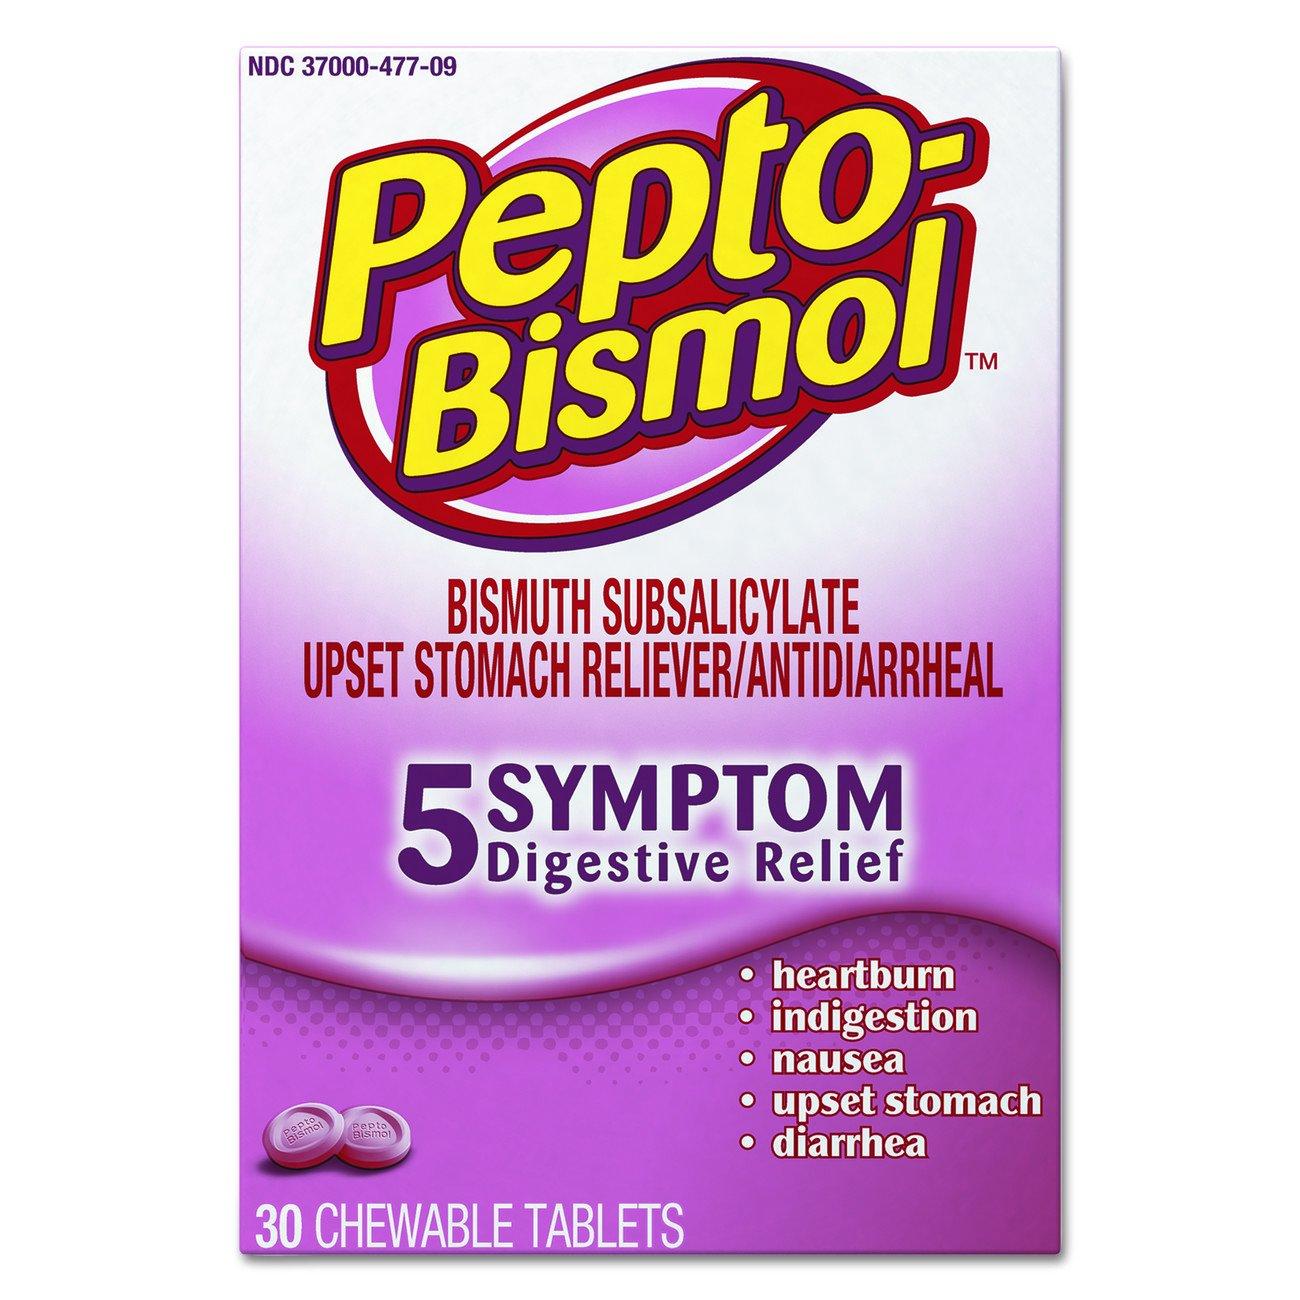 Pepto-Bismol 03977 Chewable Tablet, original Flavor, 30 Per Box, Pack of 24